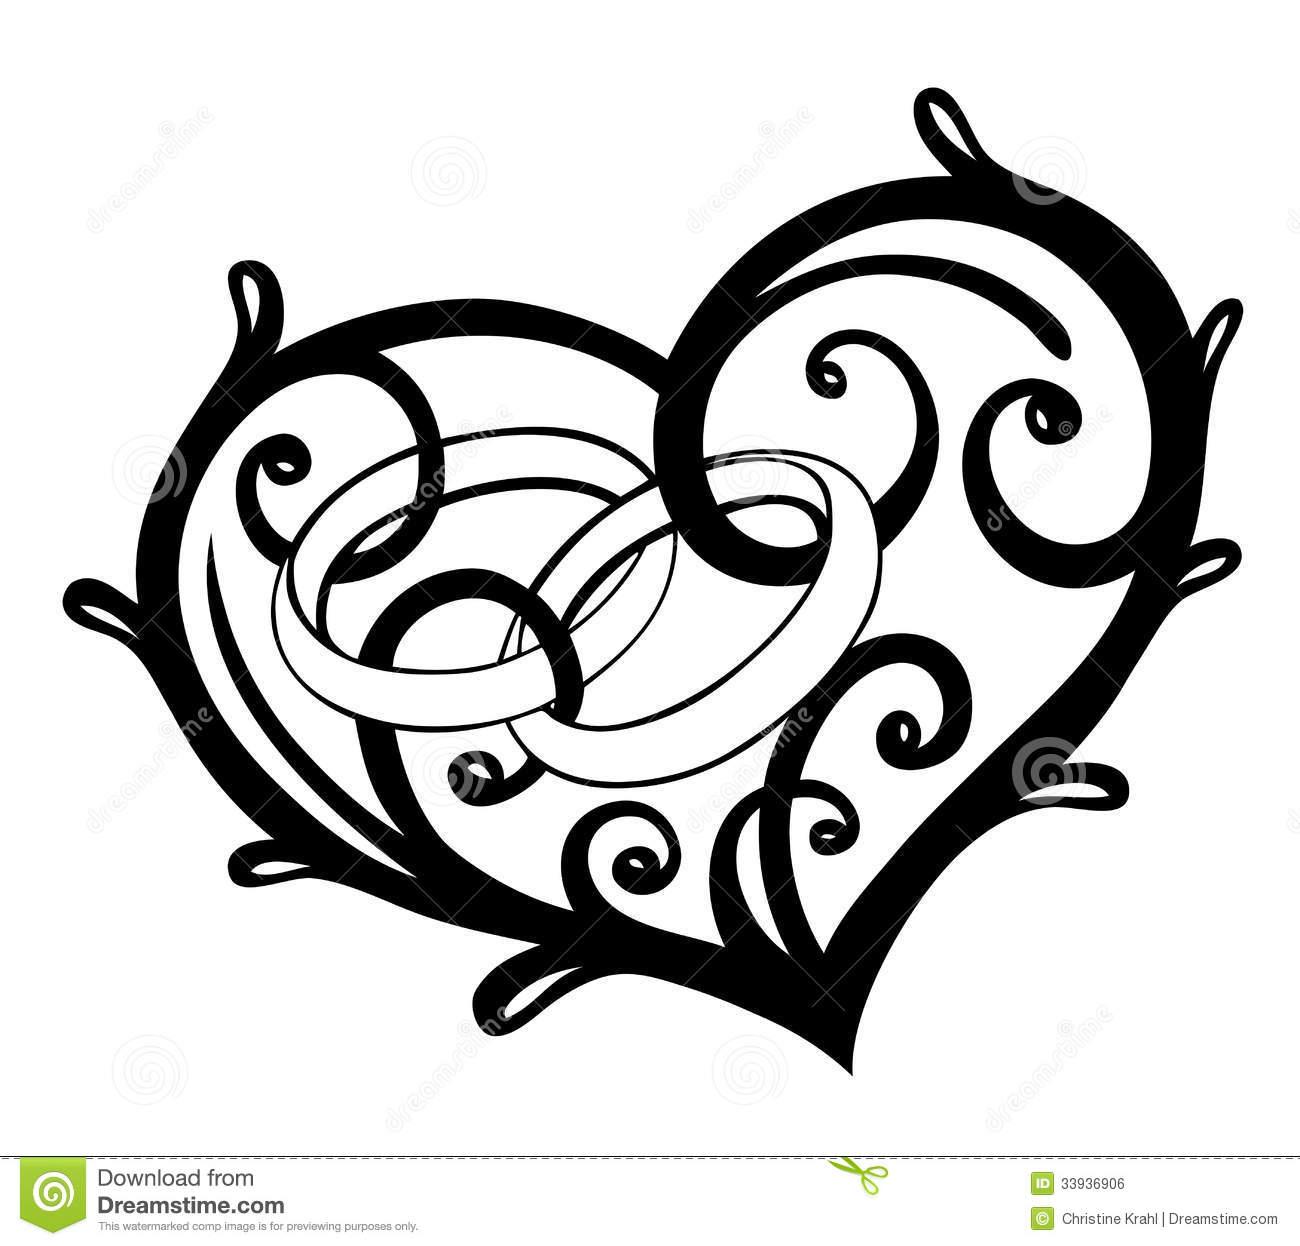 Heart Wedding Rings Clip Art